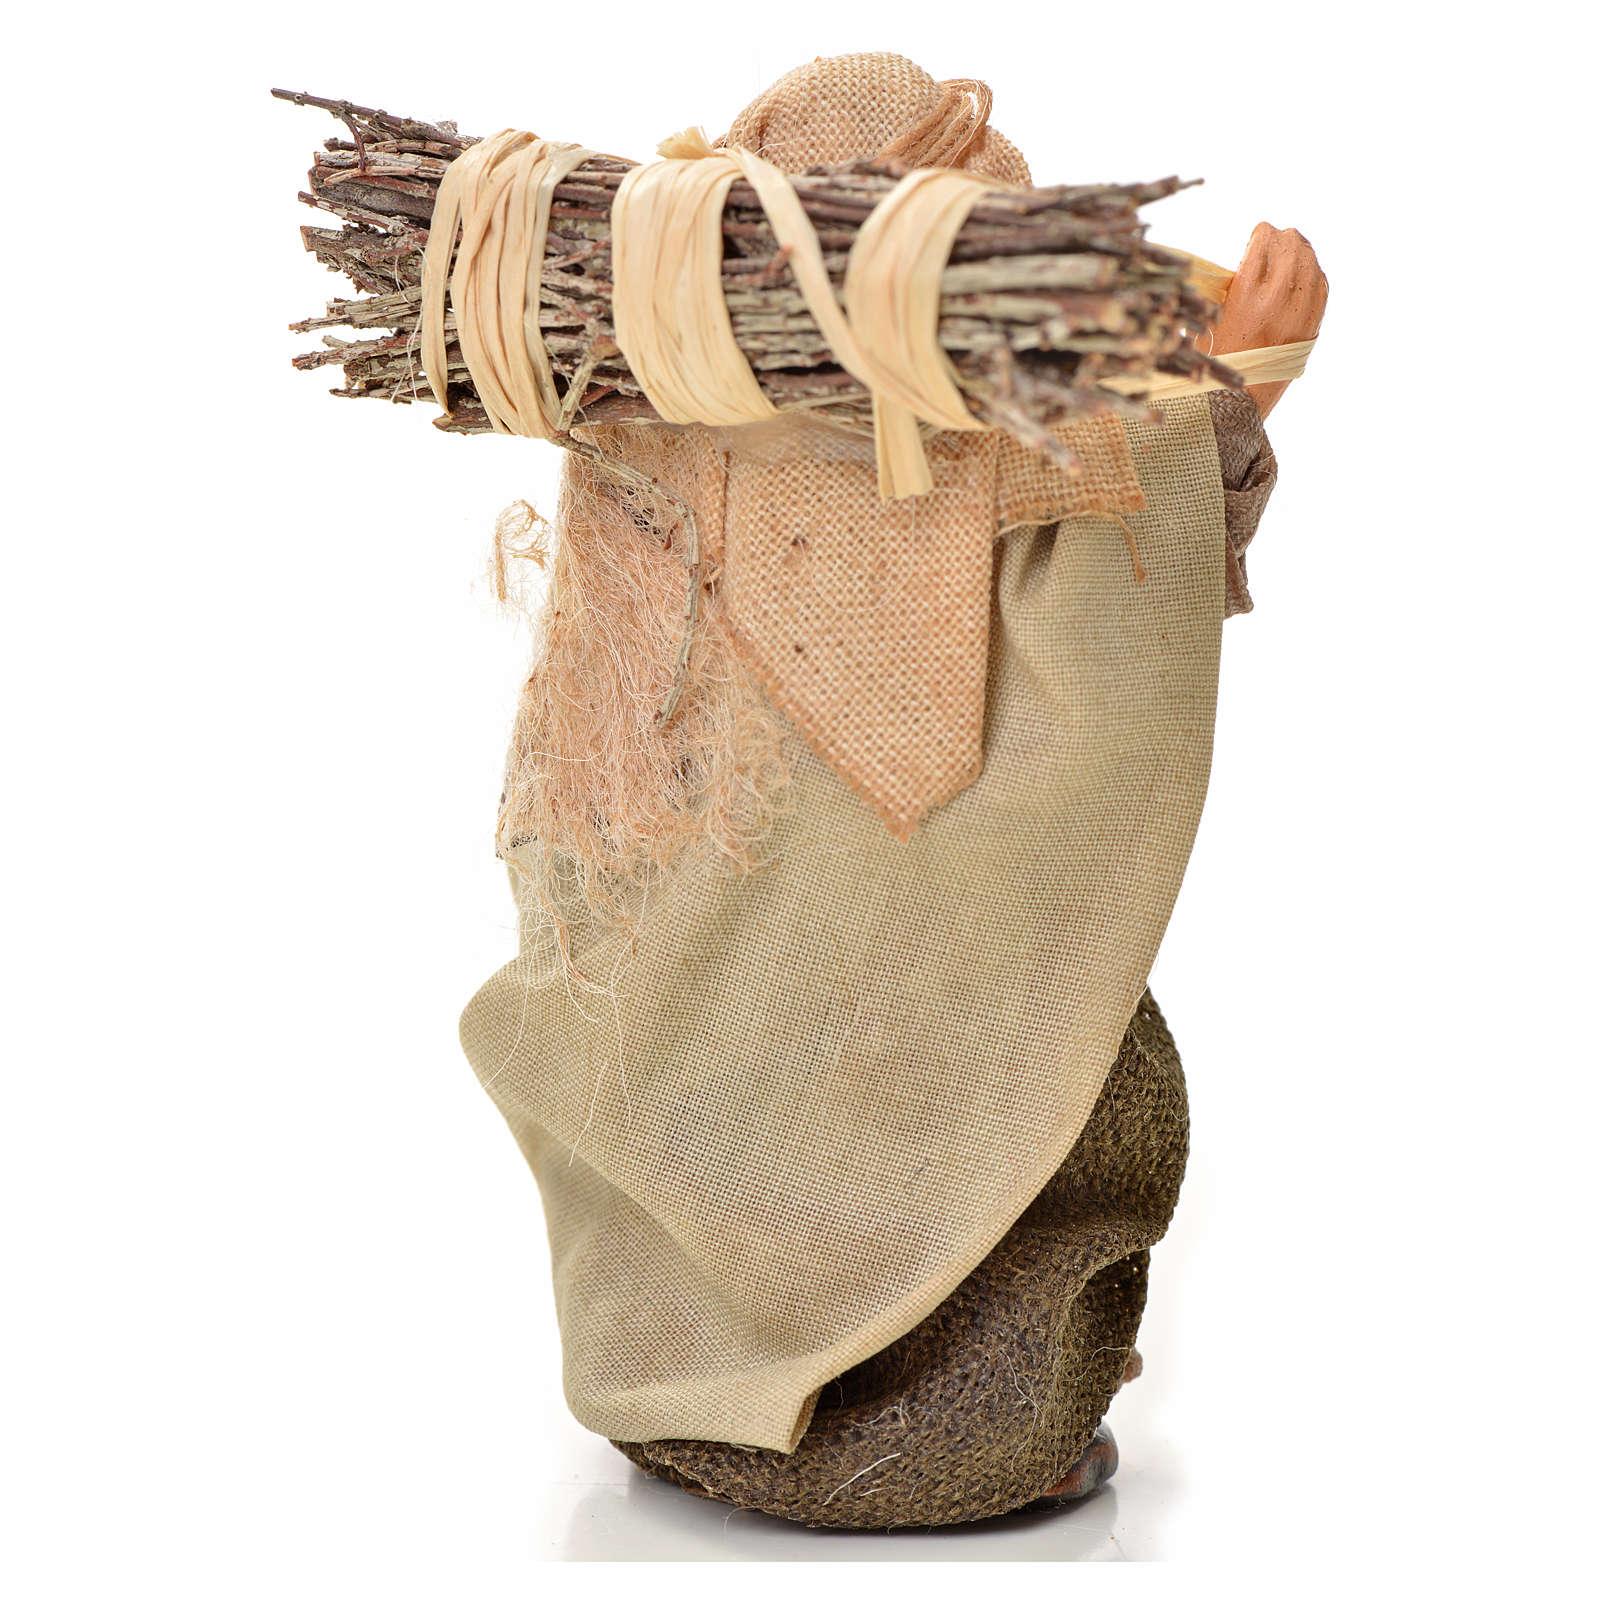 Neapolitan Nativity figurine, man with wood bundle, 6 cm 4